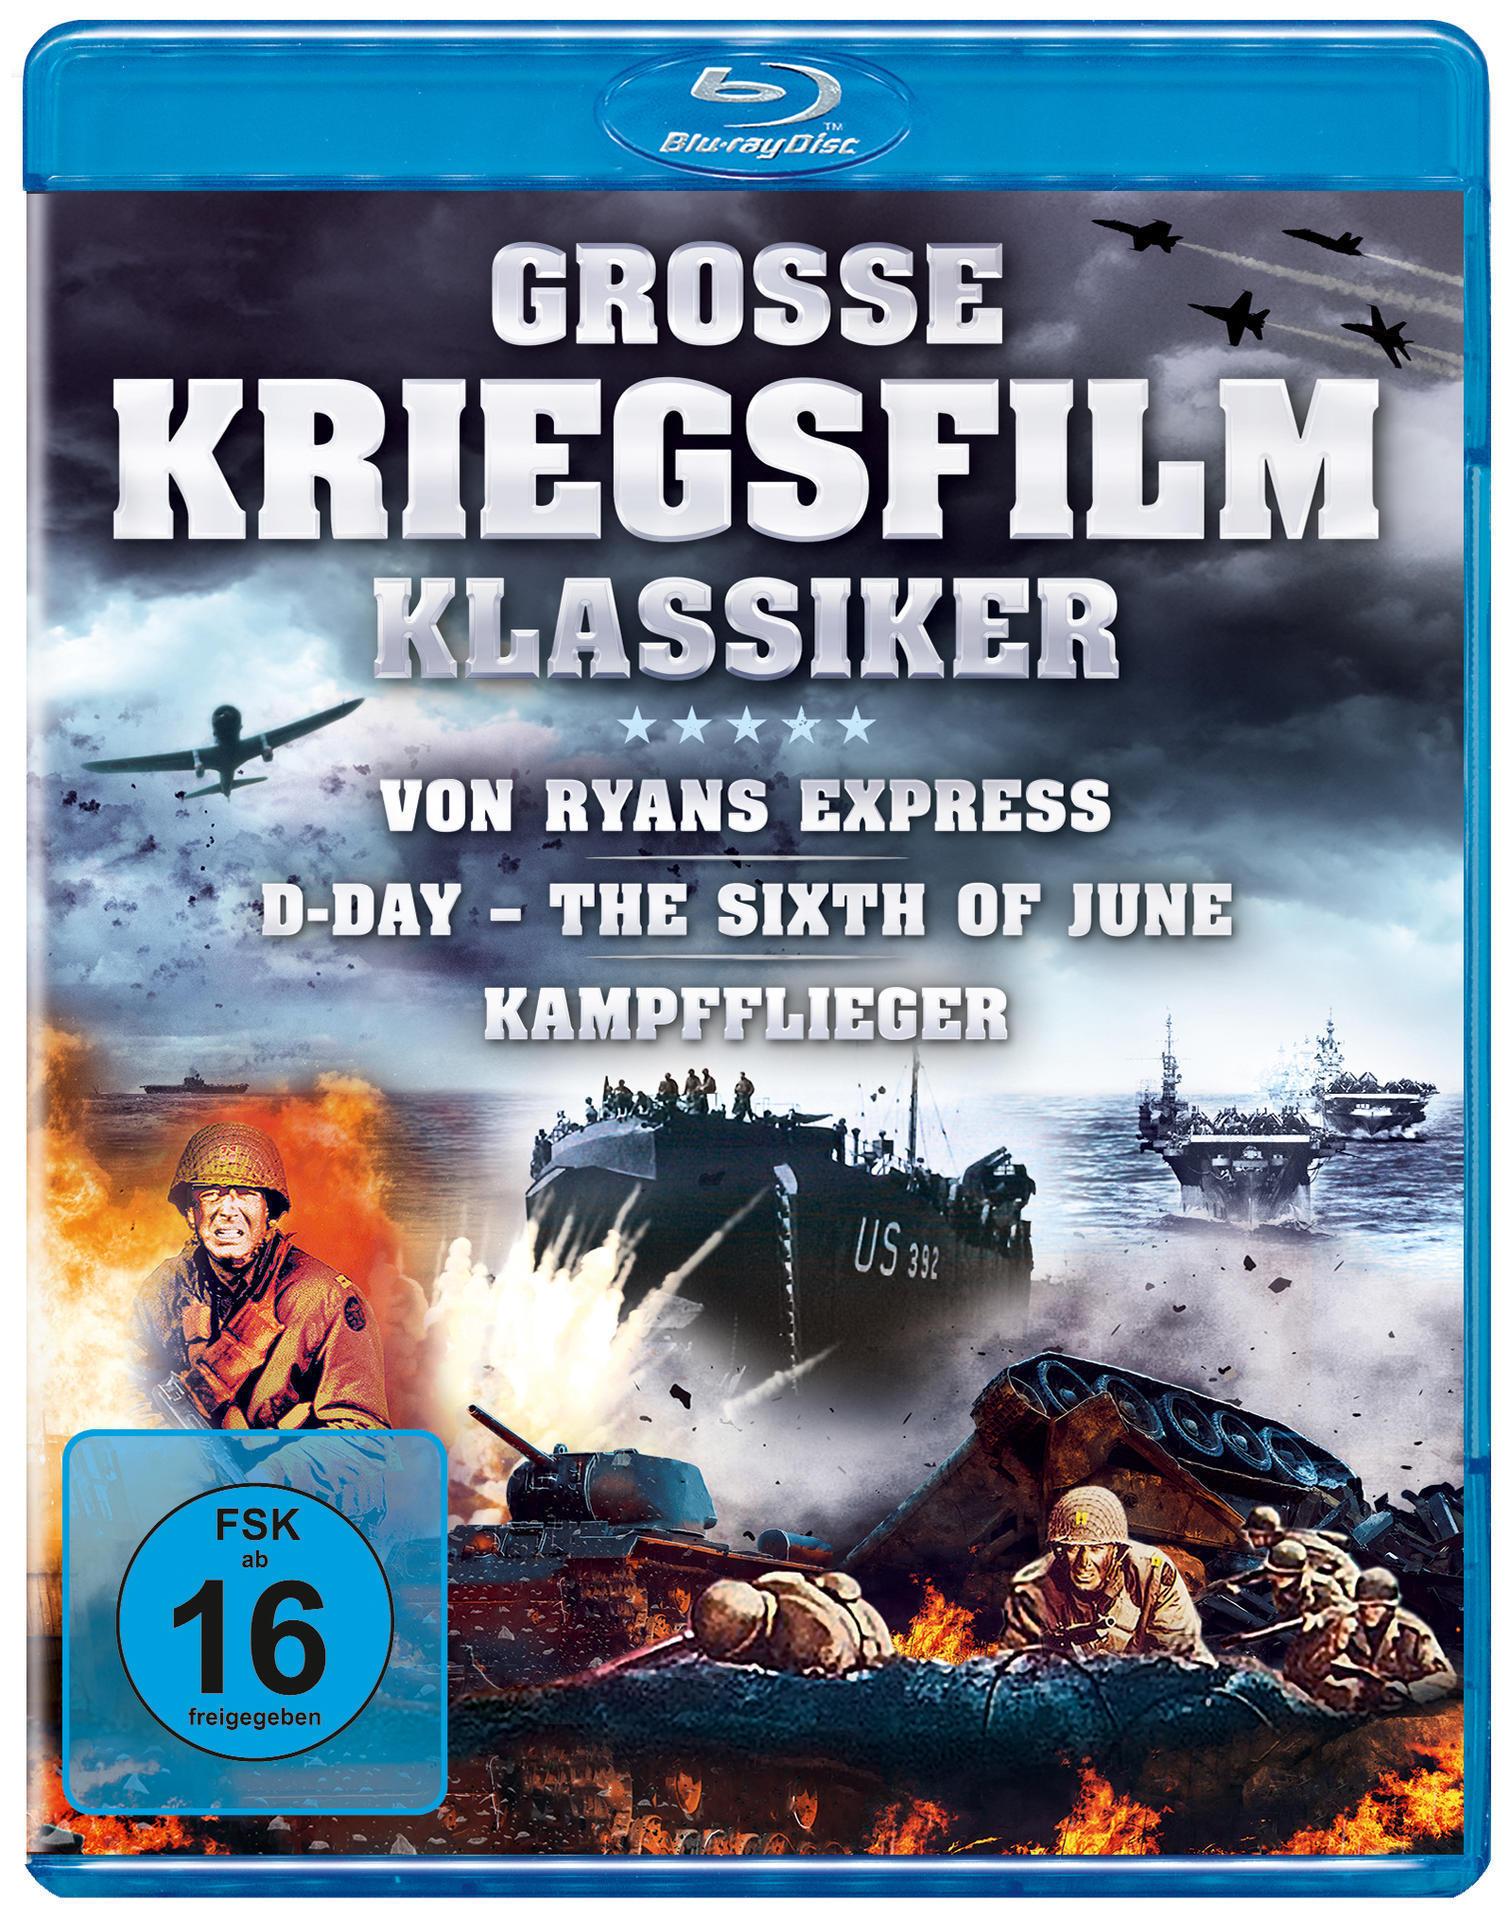 Große Kriegsfilm-Klassiker BLU-RAY Box (BLU-RAY) für 16,99 Euro